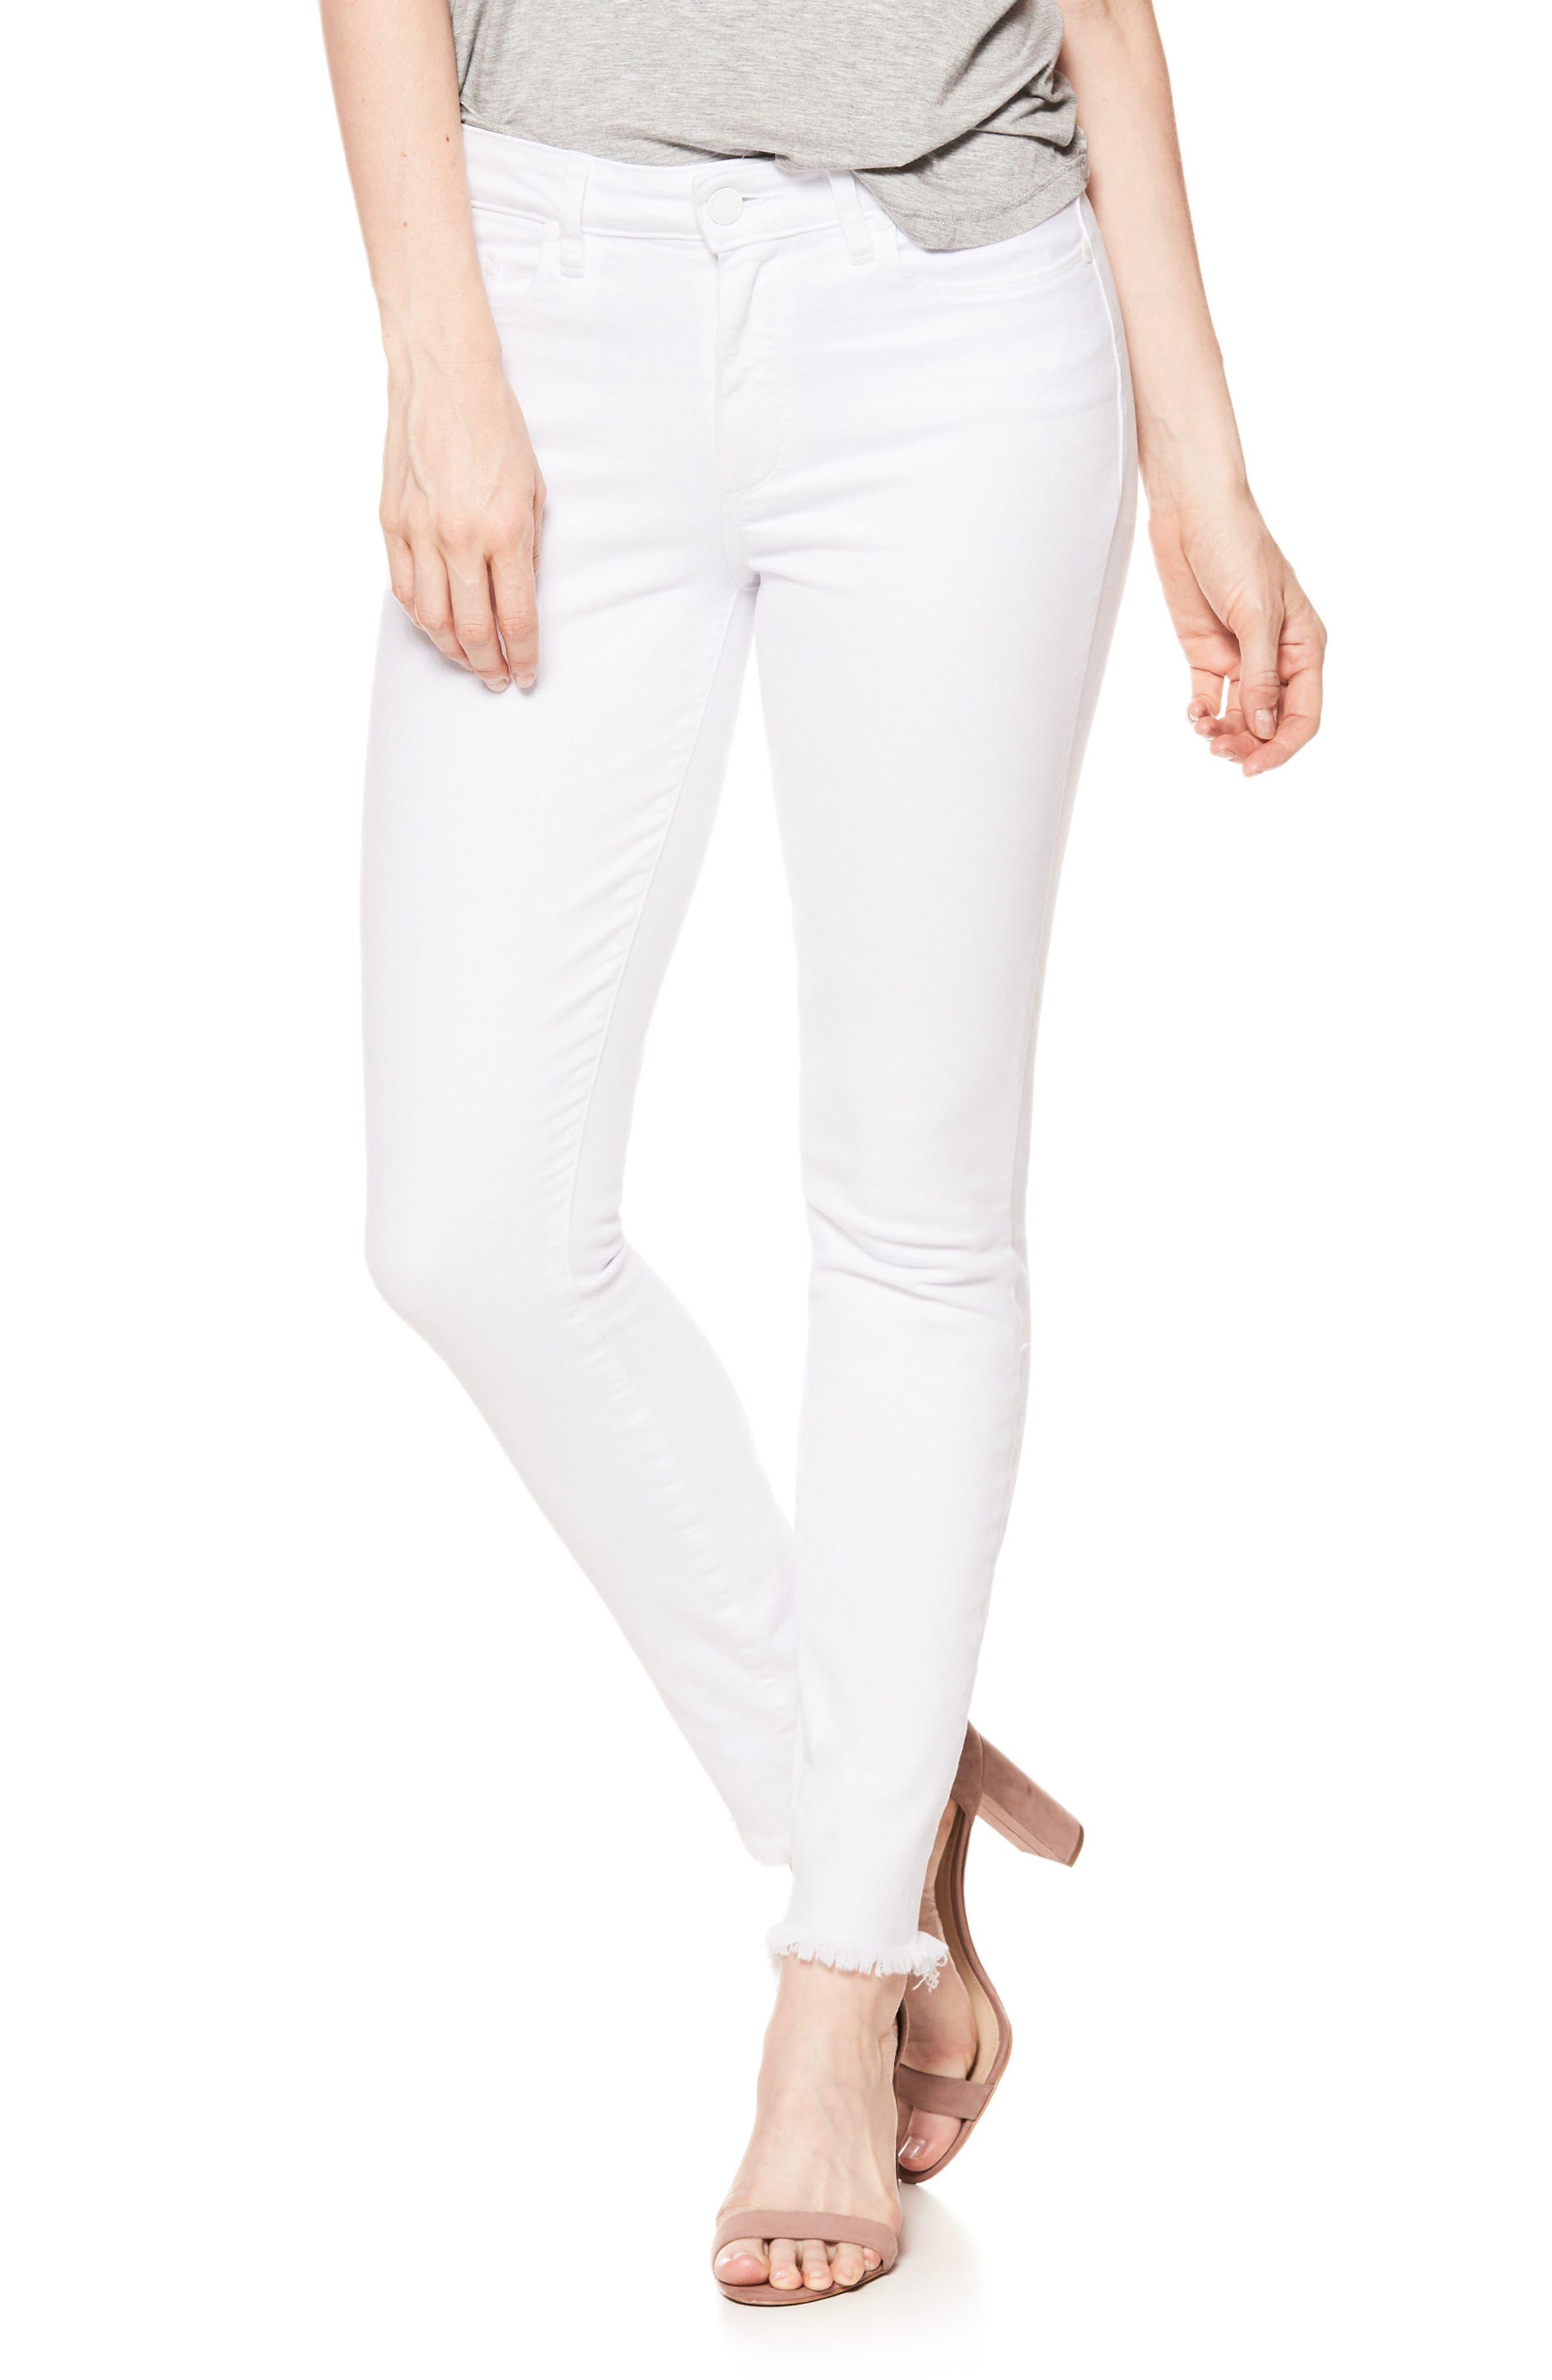 Hoxton High Waist Ankle Skinny Jeans,                             Main thumbnail 1, color,                             CRISP WHITE